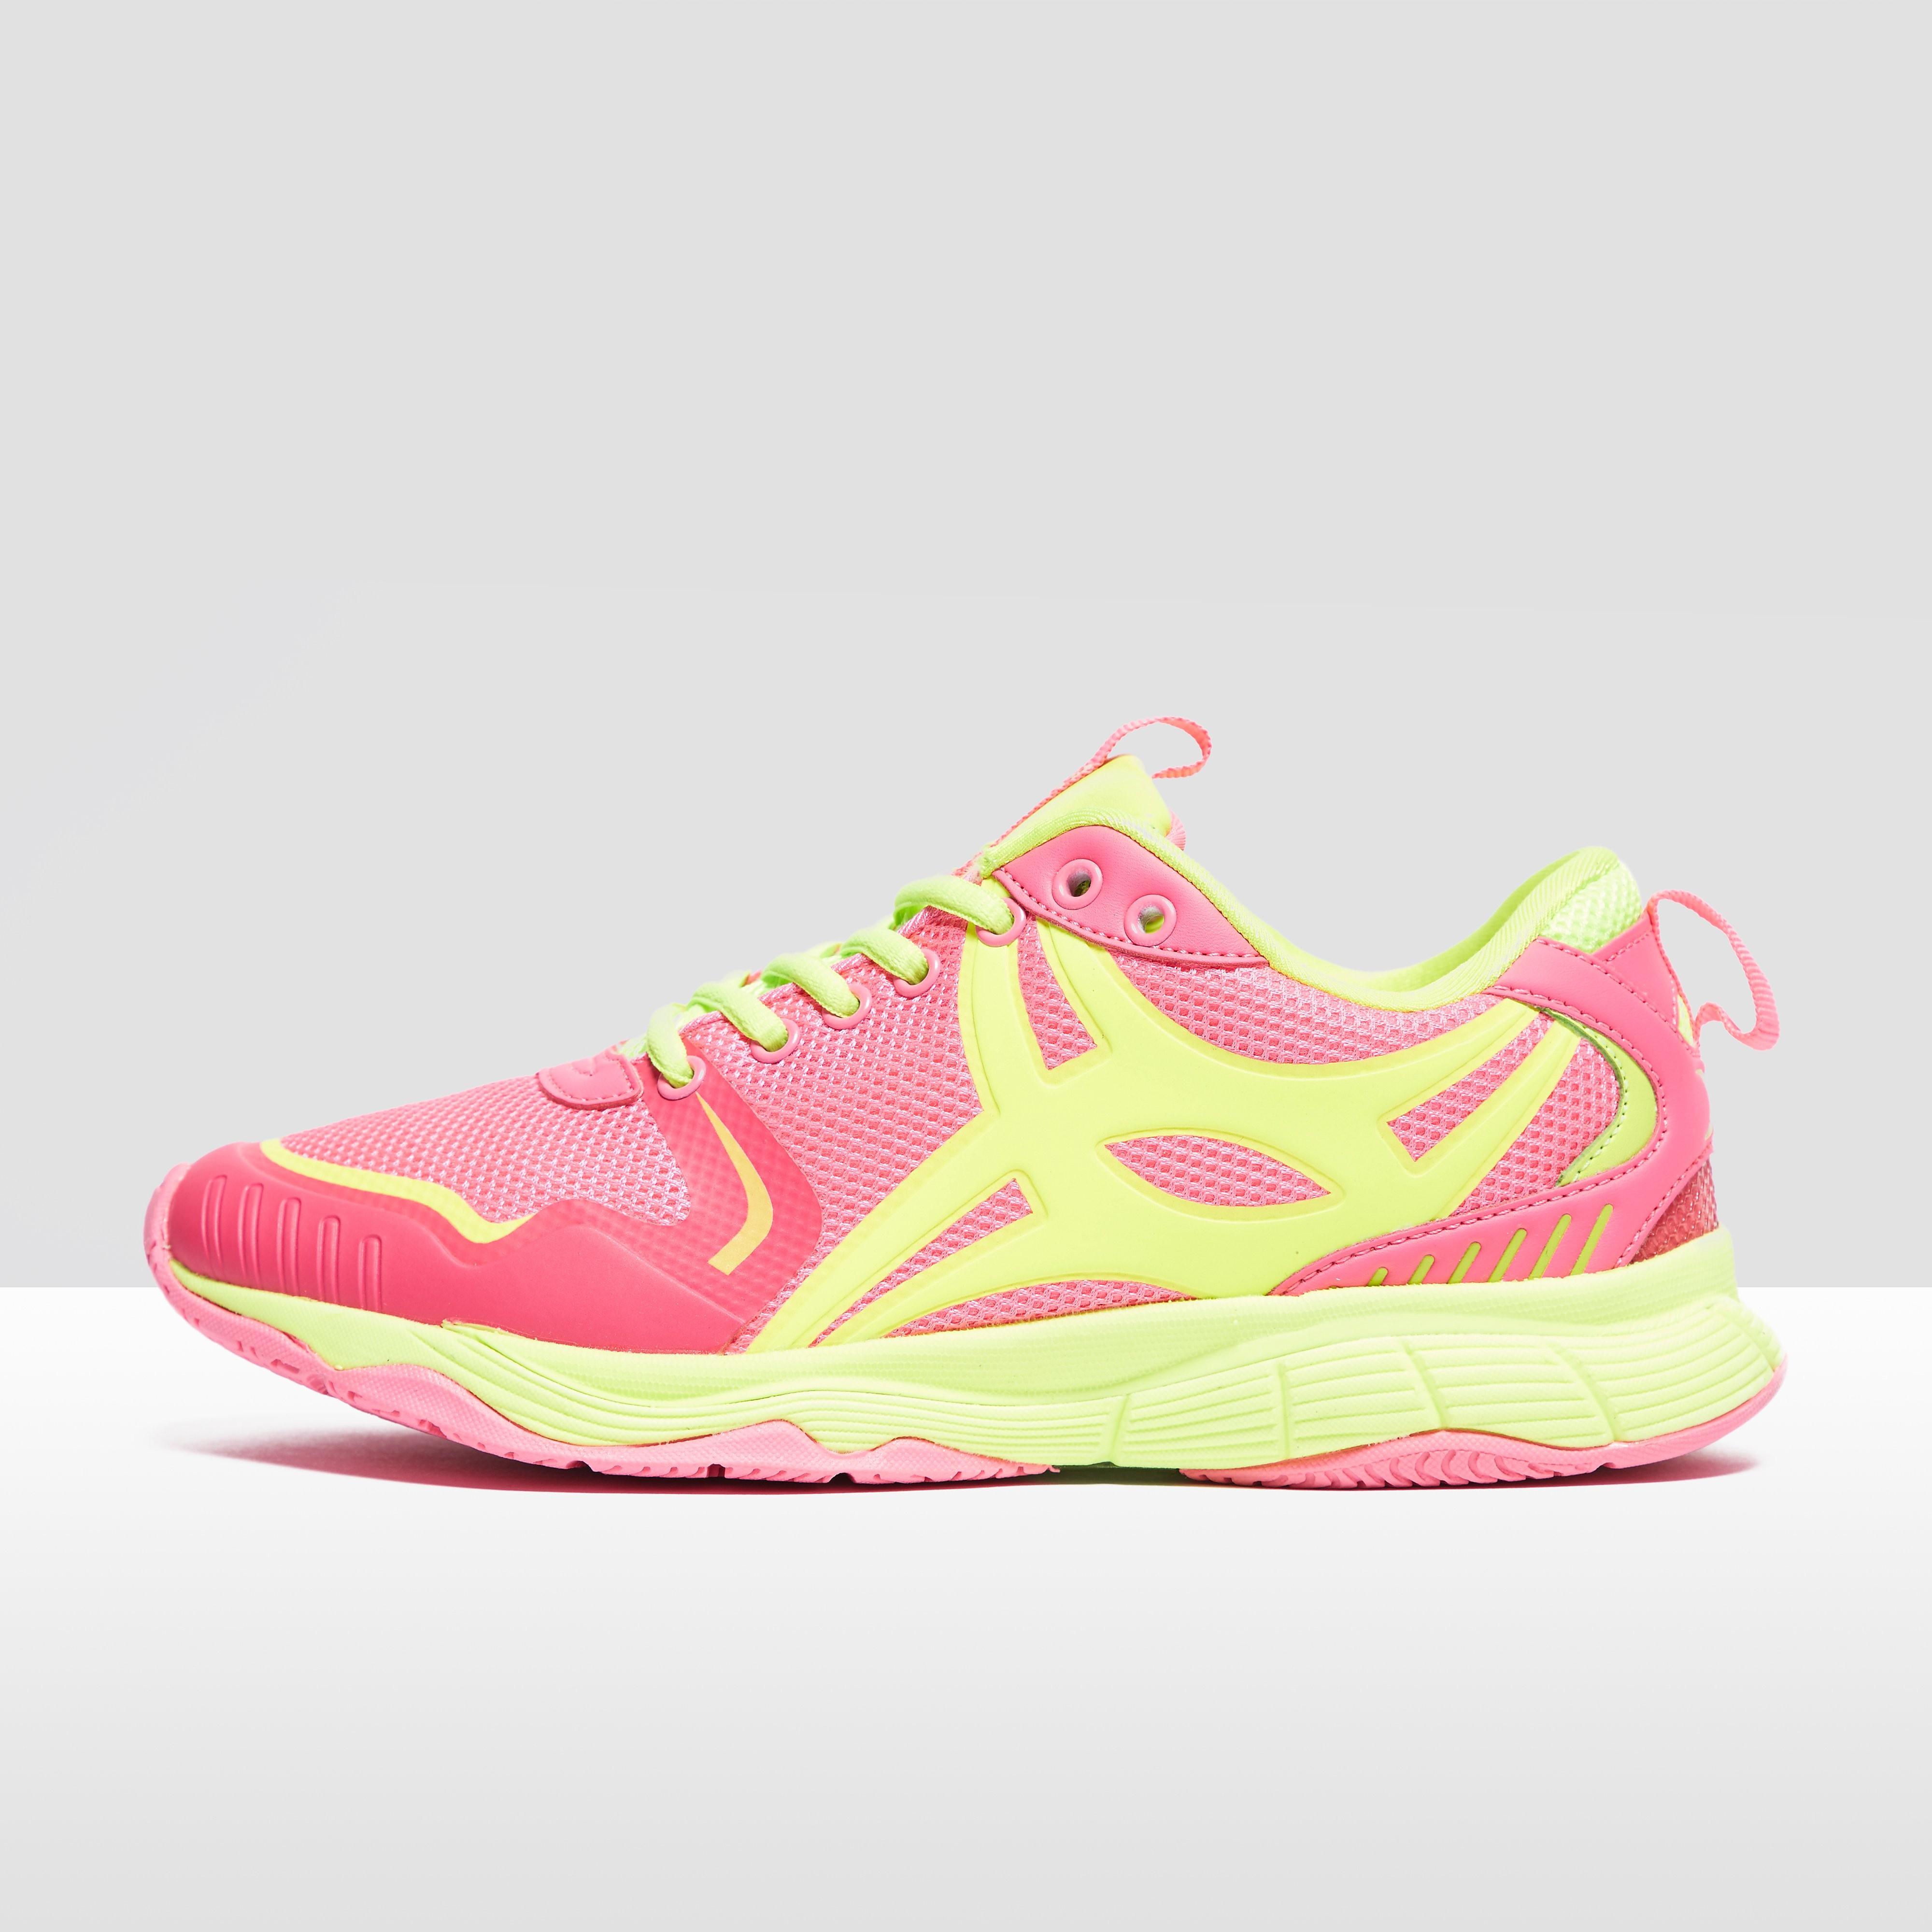 Gilbert Synergie X5 Junior Netball Shoes